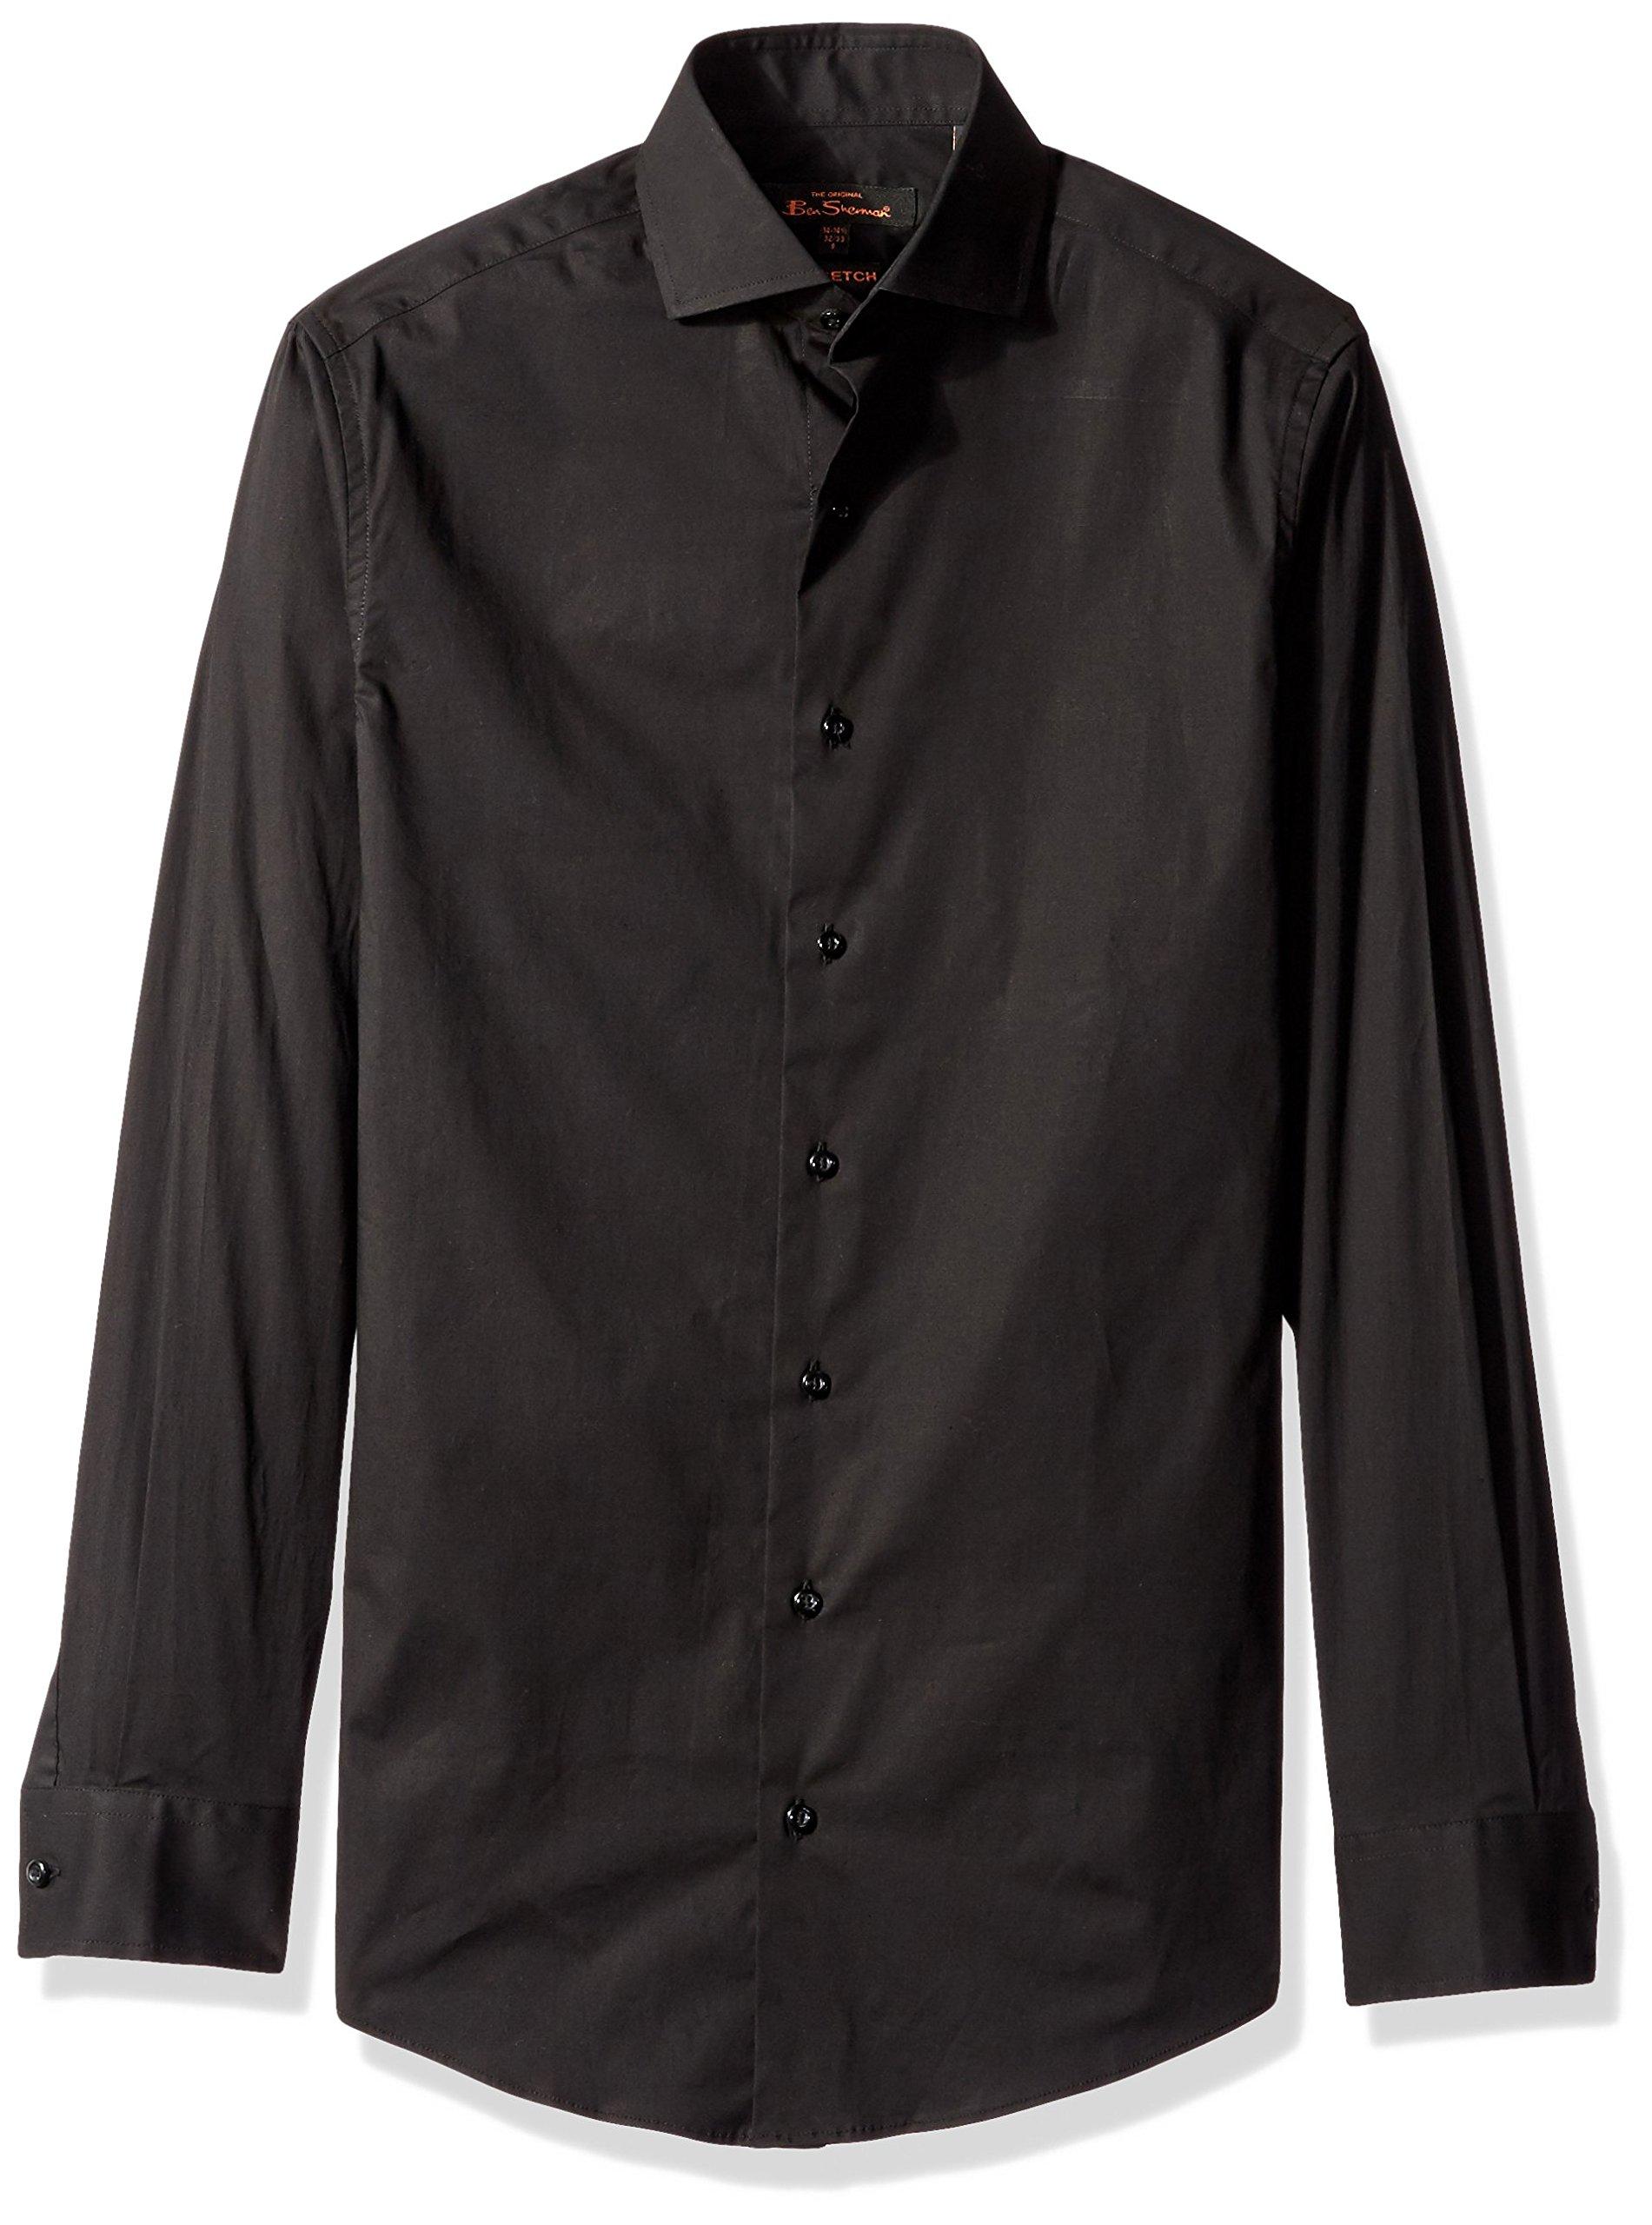 Ben Sherman Men's Solid Stretch Poplin Dress Shirt, Black, 14''-14.5'' Neck 32''-33'' Sleeve by Ben Sherman